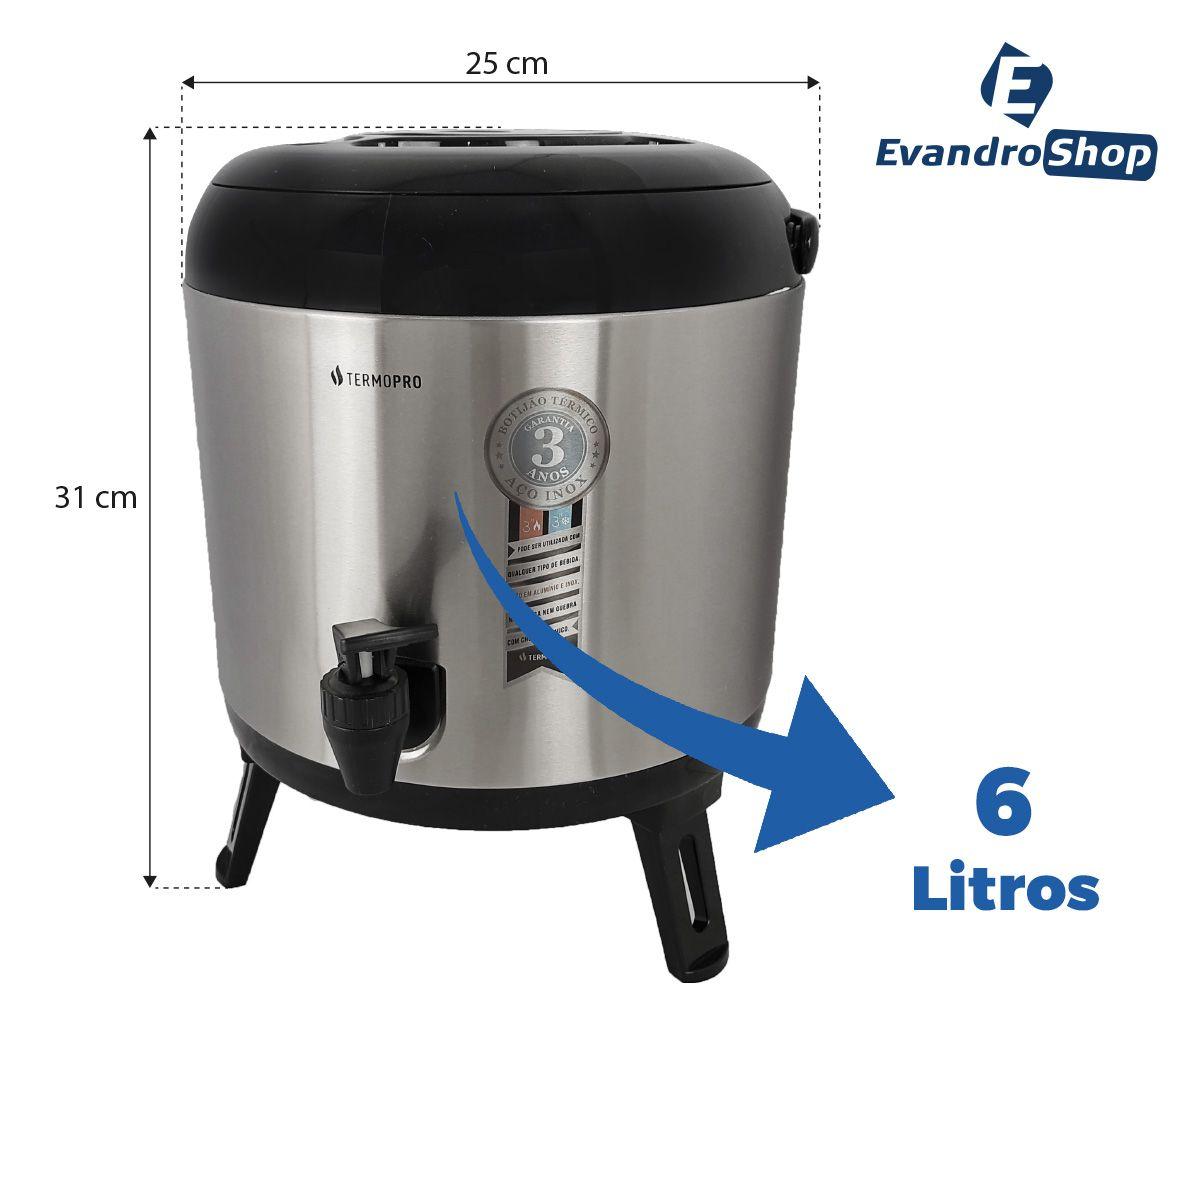 Botijão Térmico 6 Litros Inox - Termopro